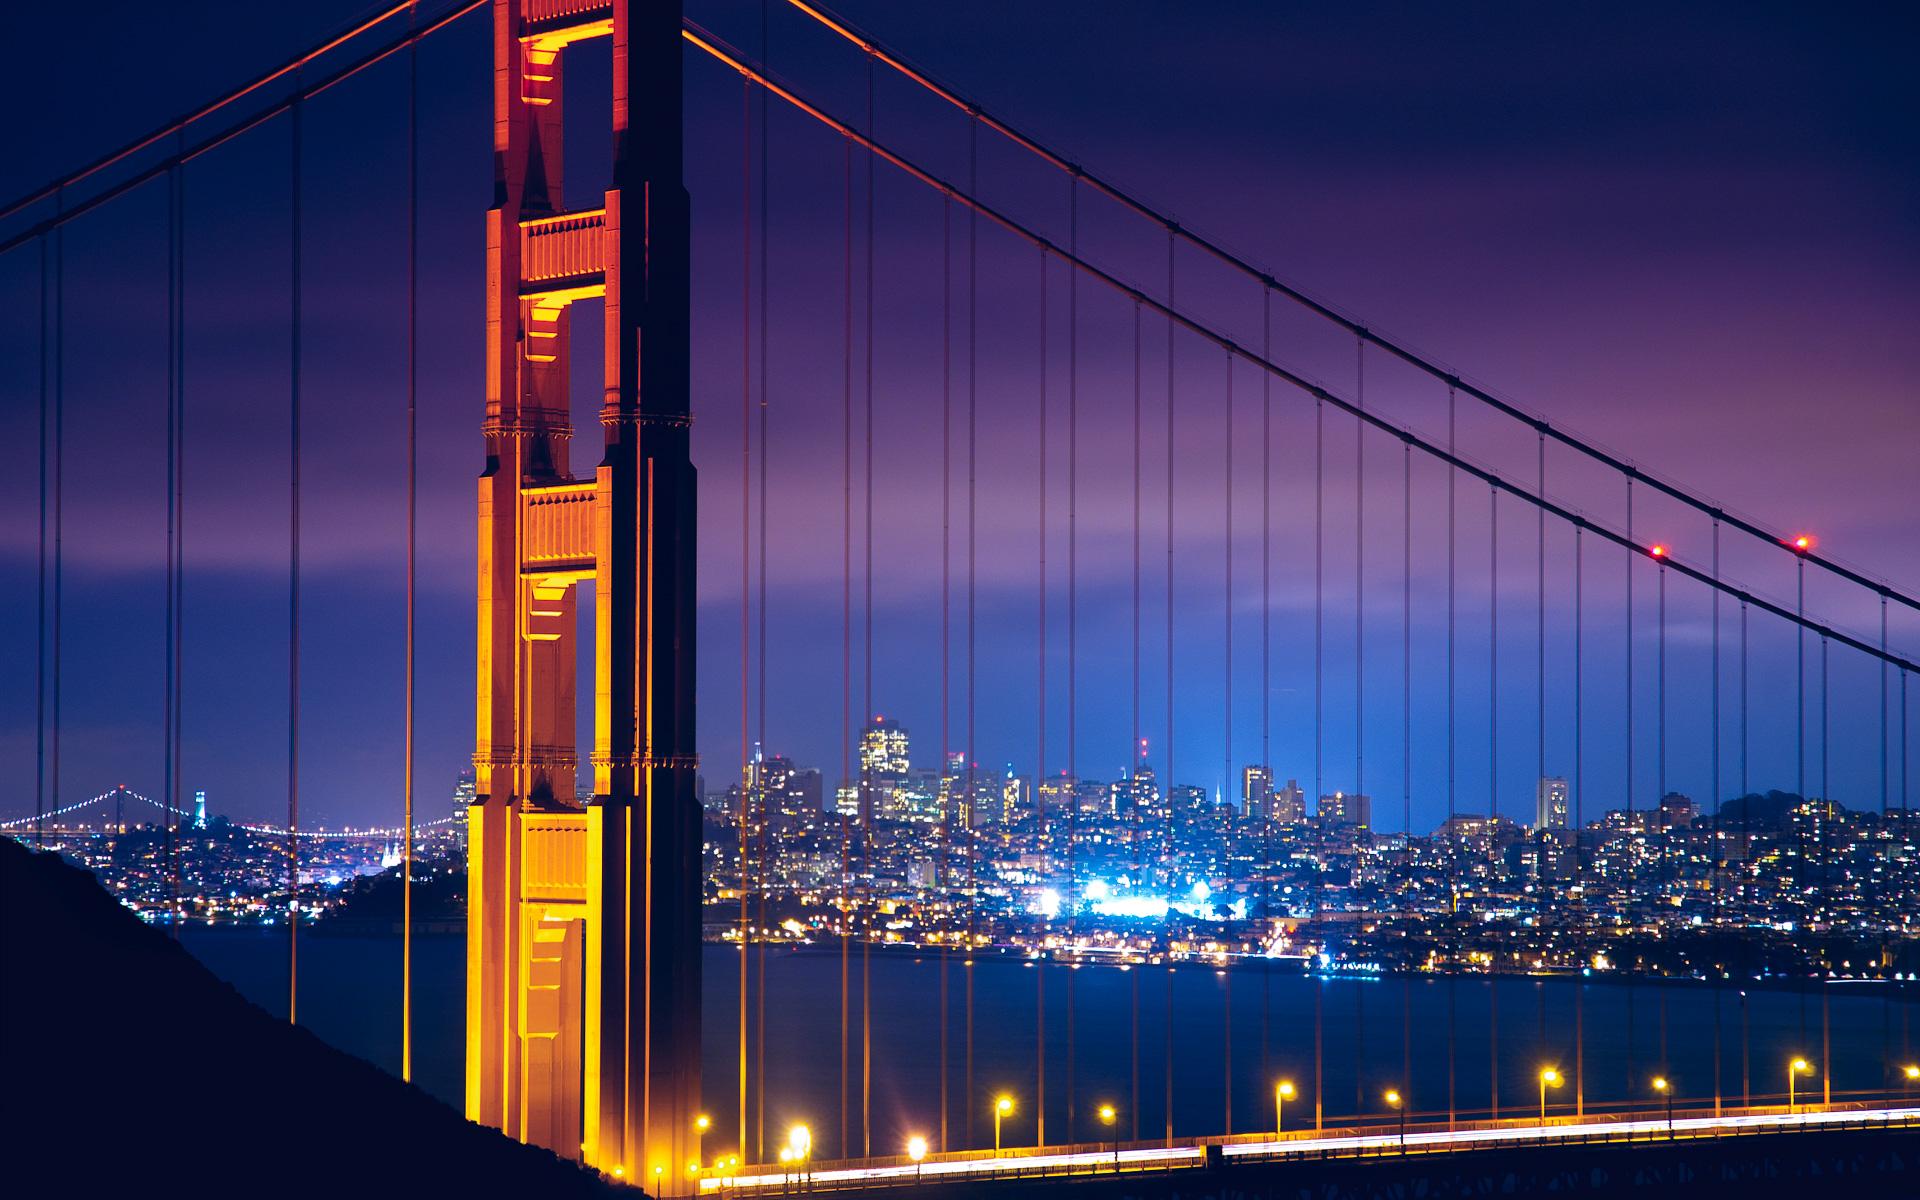 Los Angeles Quotes Wallpapers Daily Wallpaper Golden Gate Bridge San Francisco